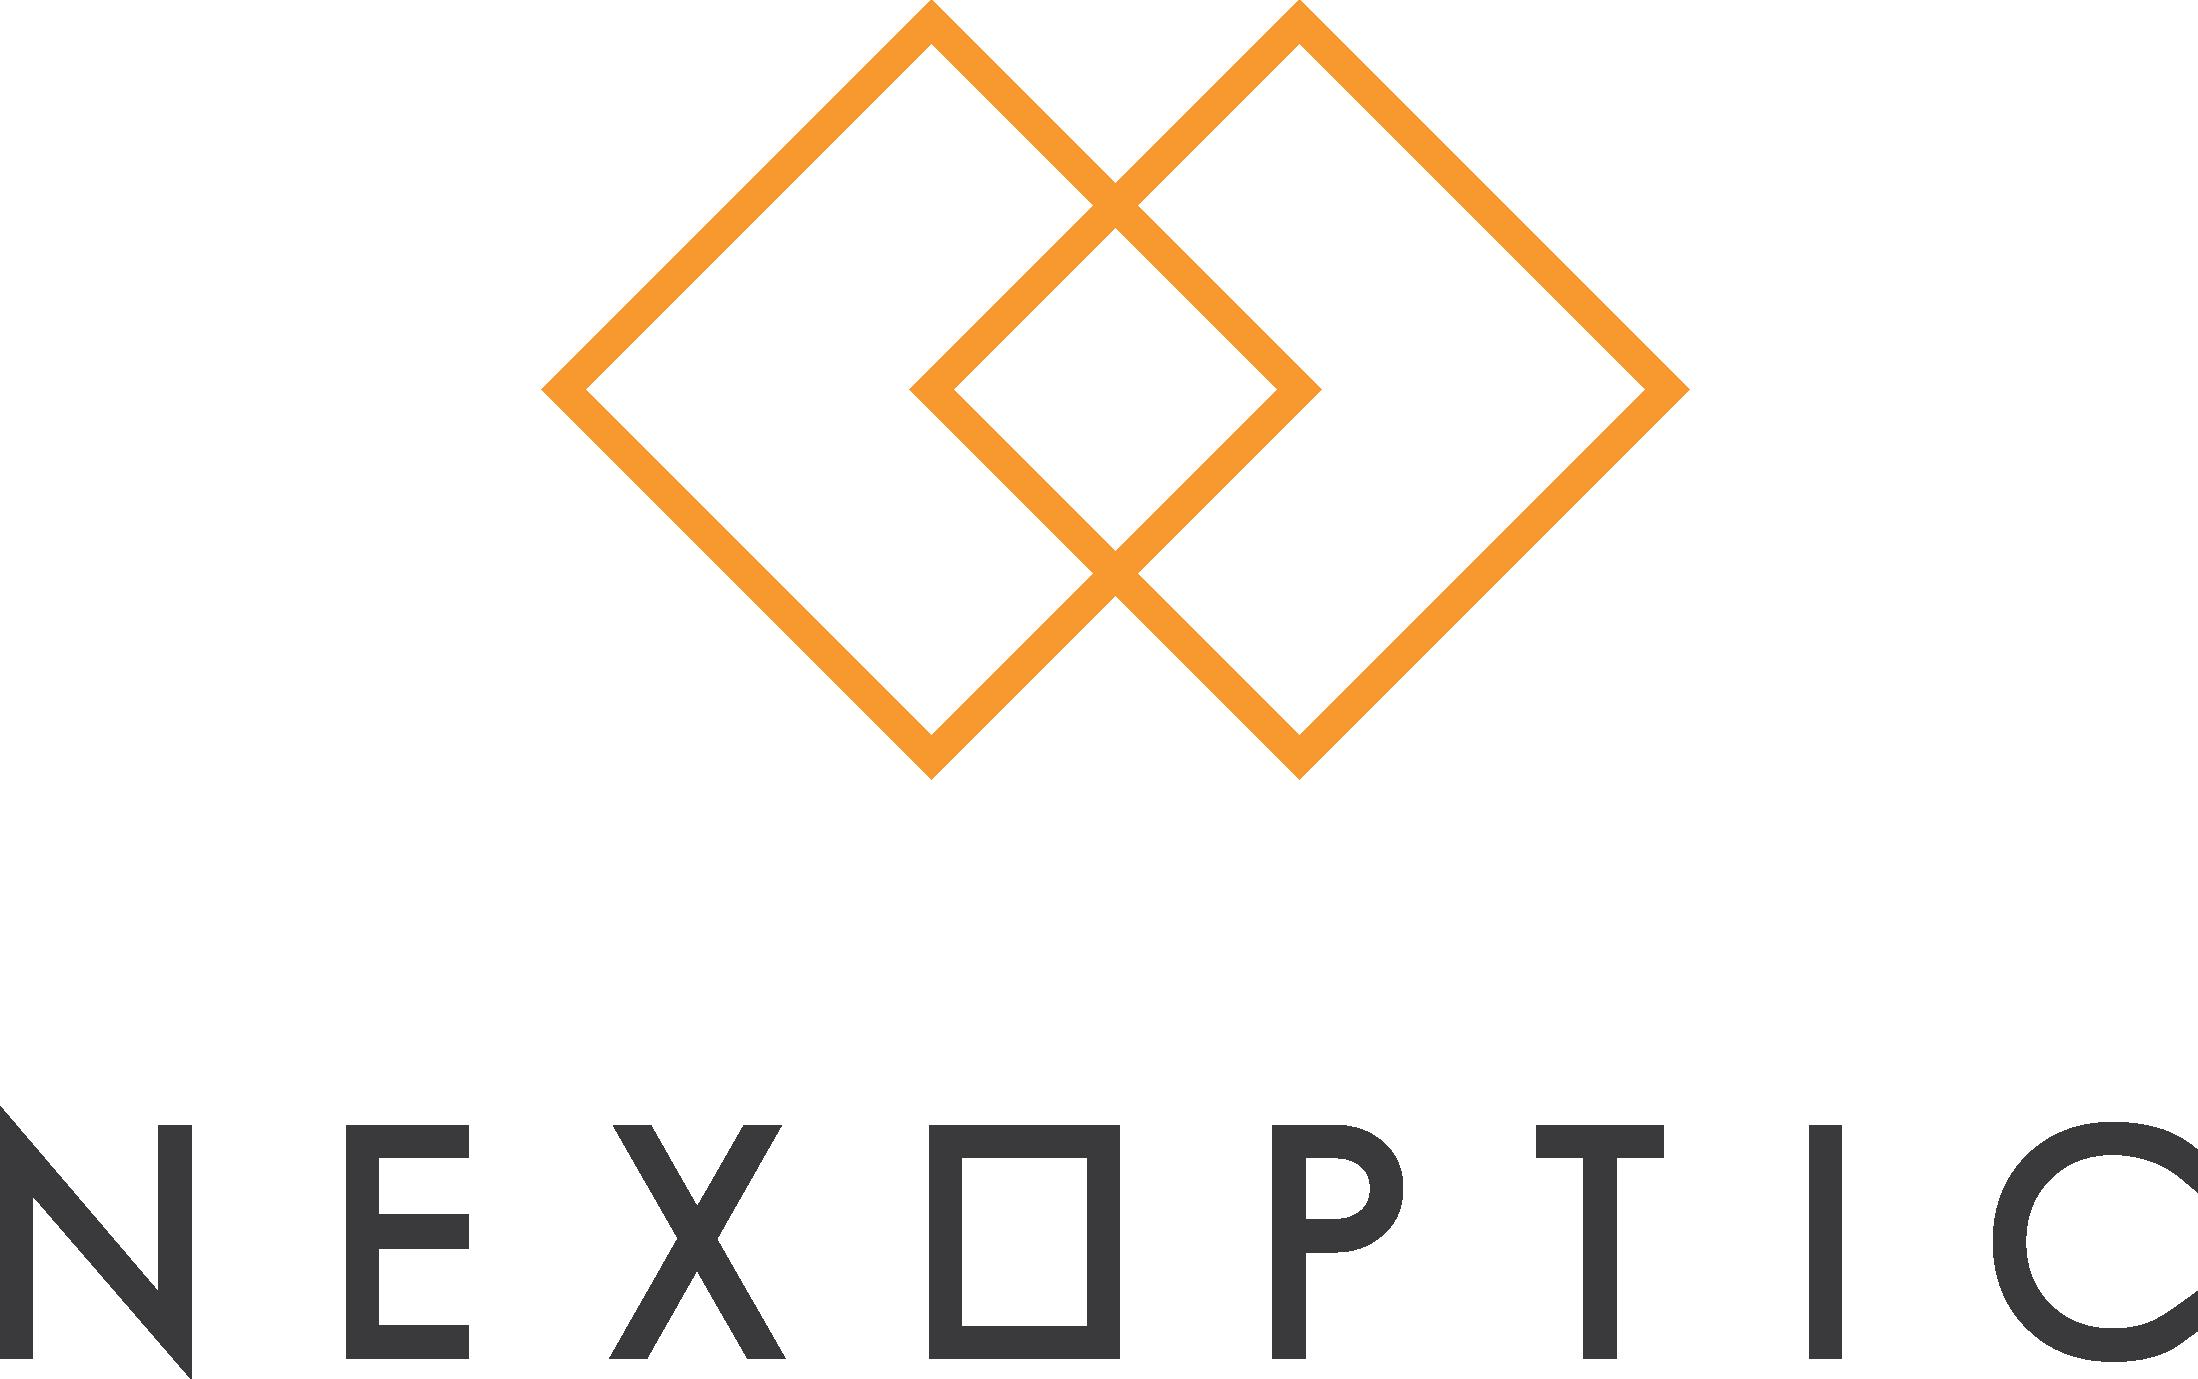 NexOptic Provides Update on Recent Market Activity